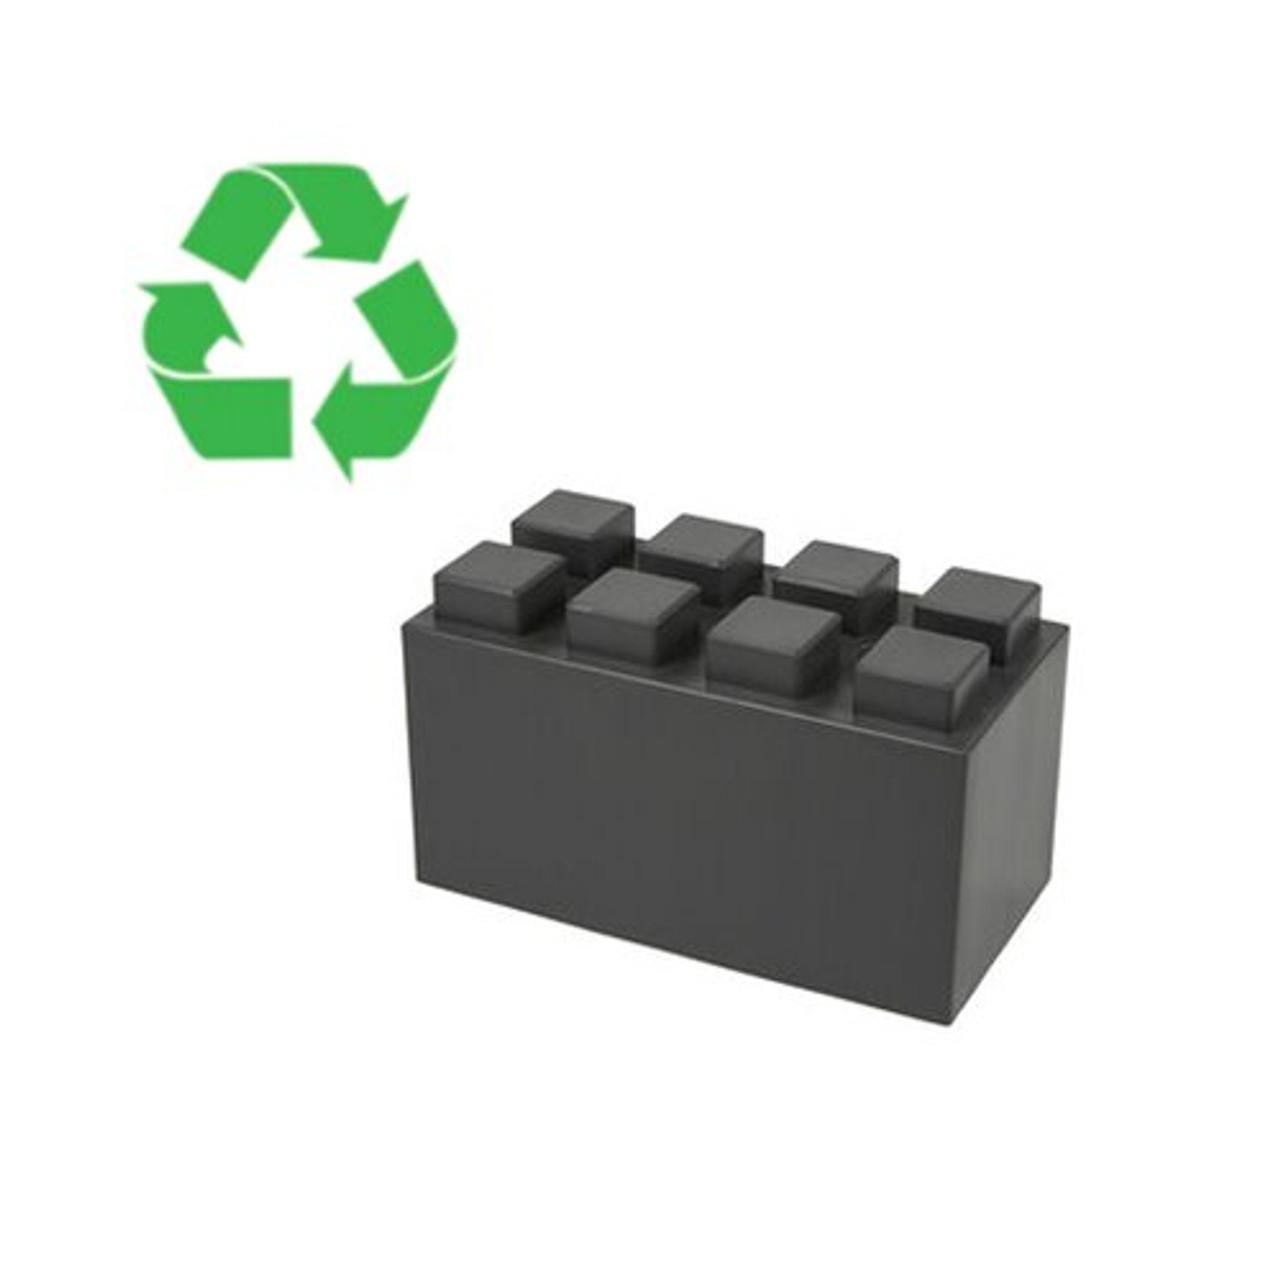 "12"" x 6"" Full Block - 100% Recycled"